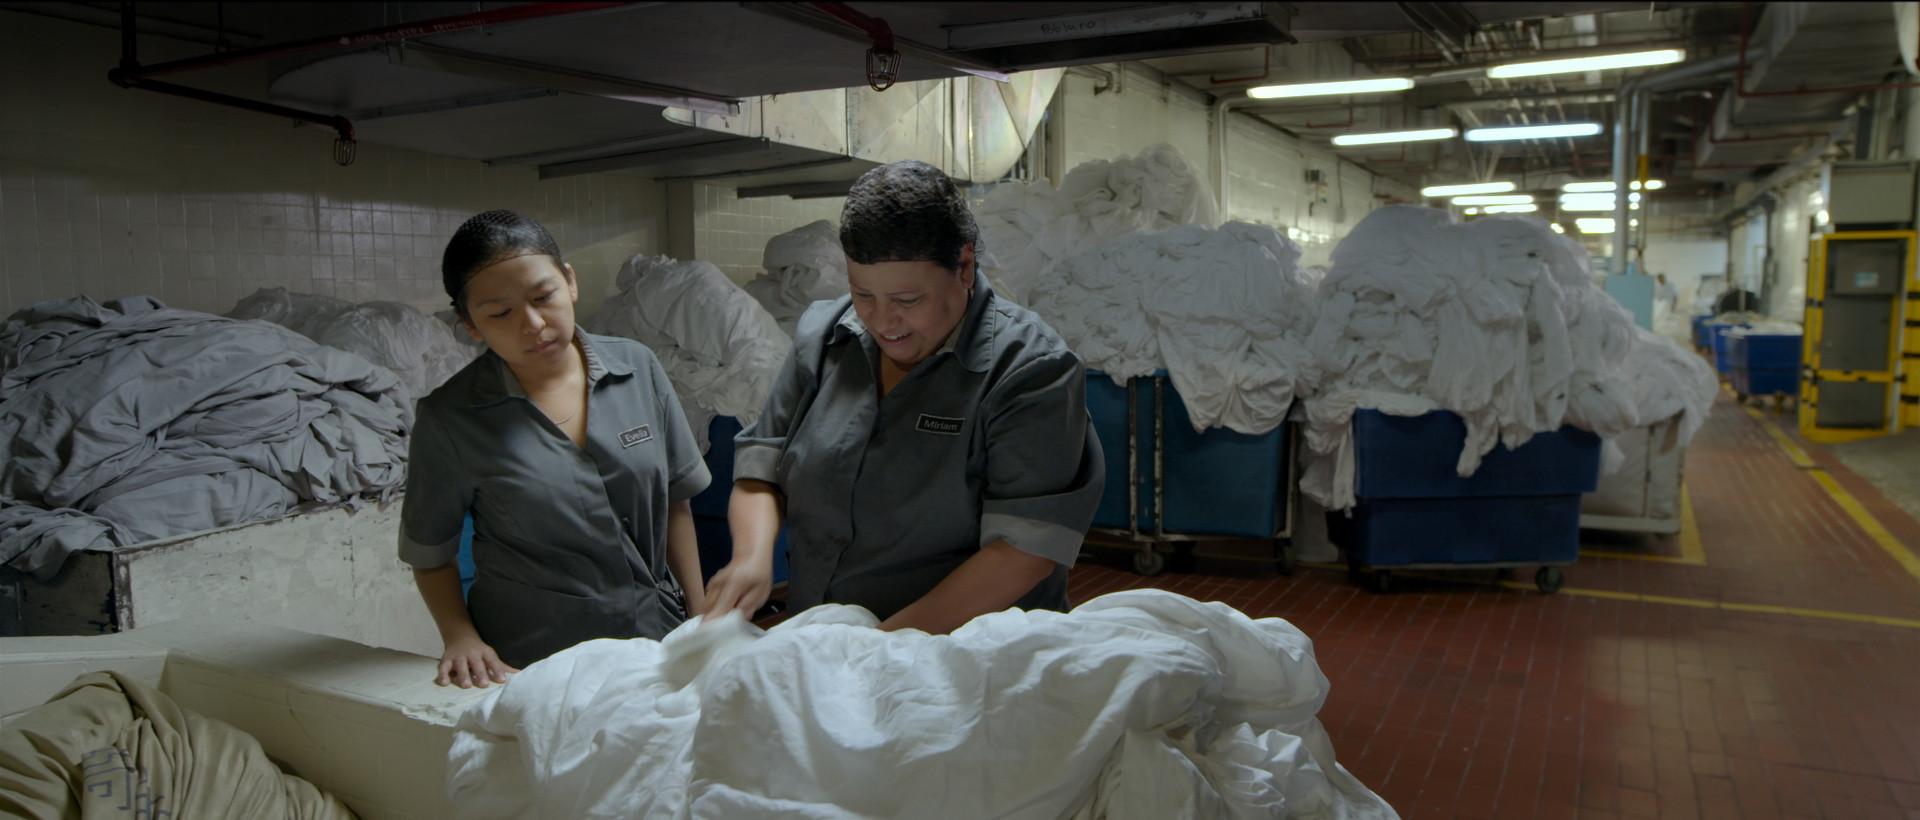 Gabriela Cartol, left, and Teresa Sanchez in a scene from